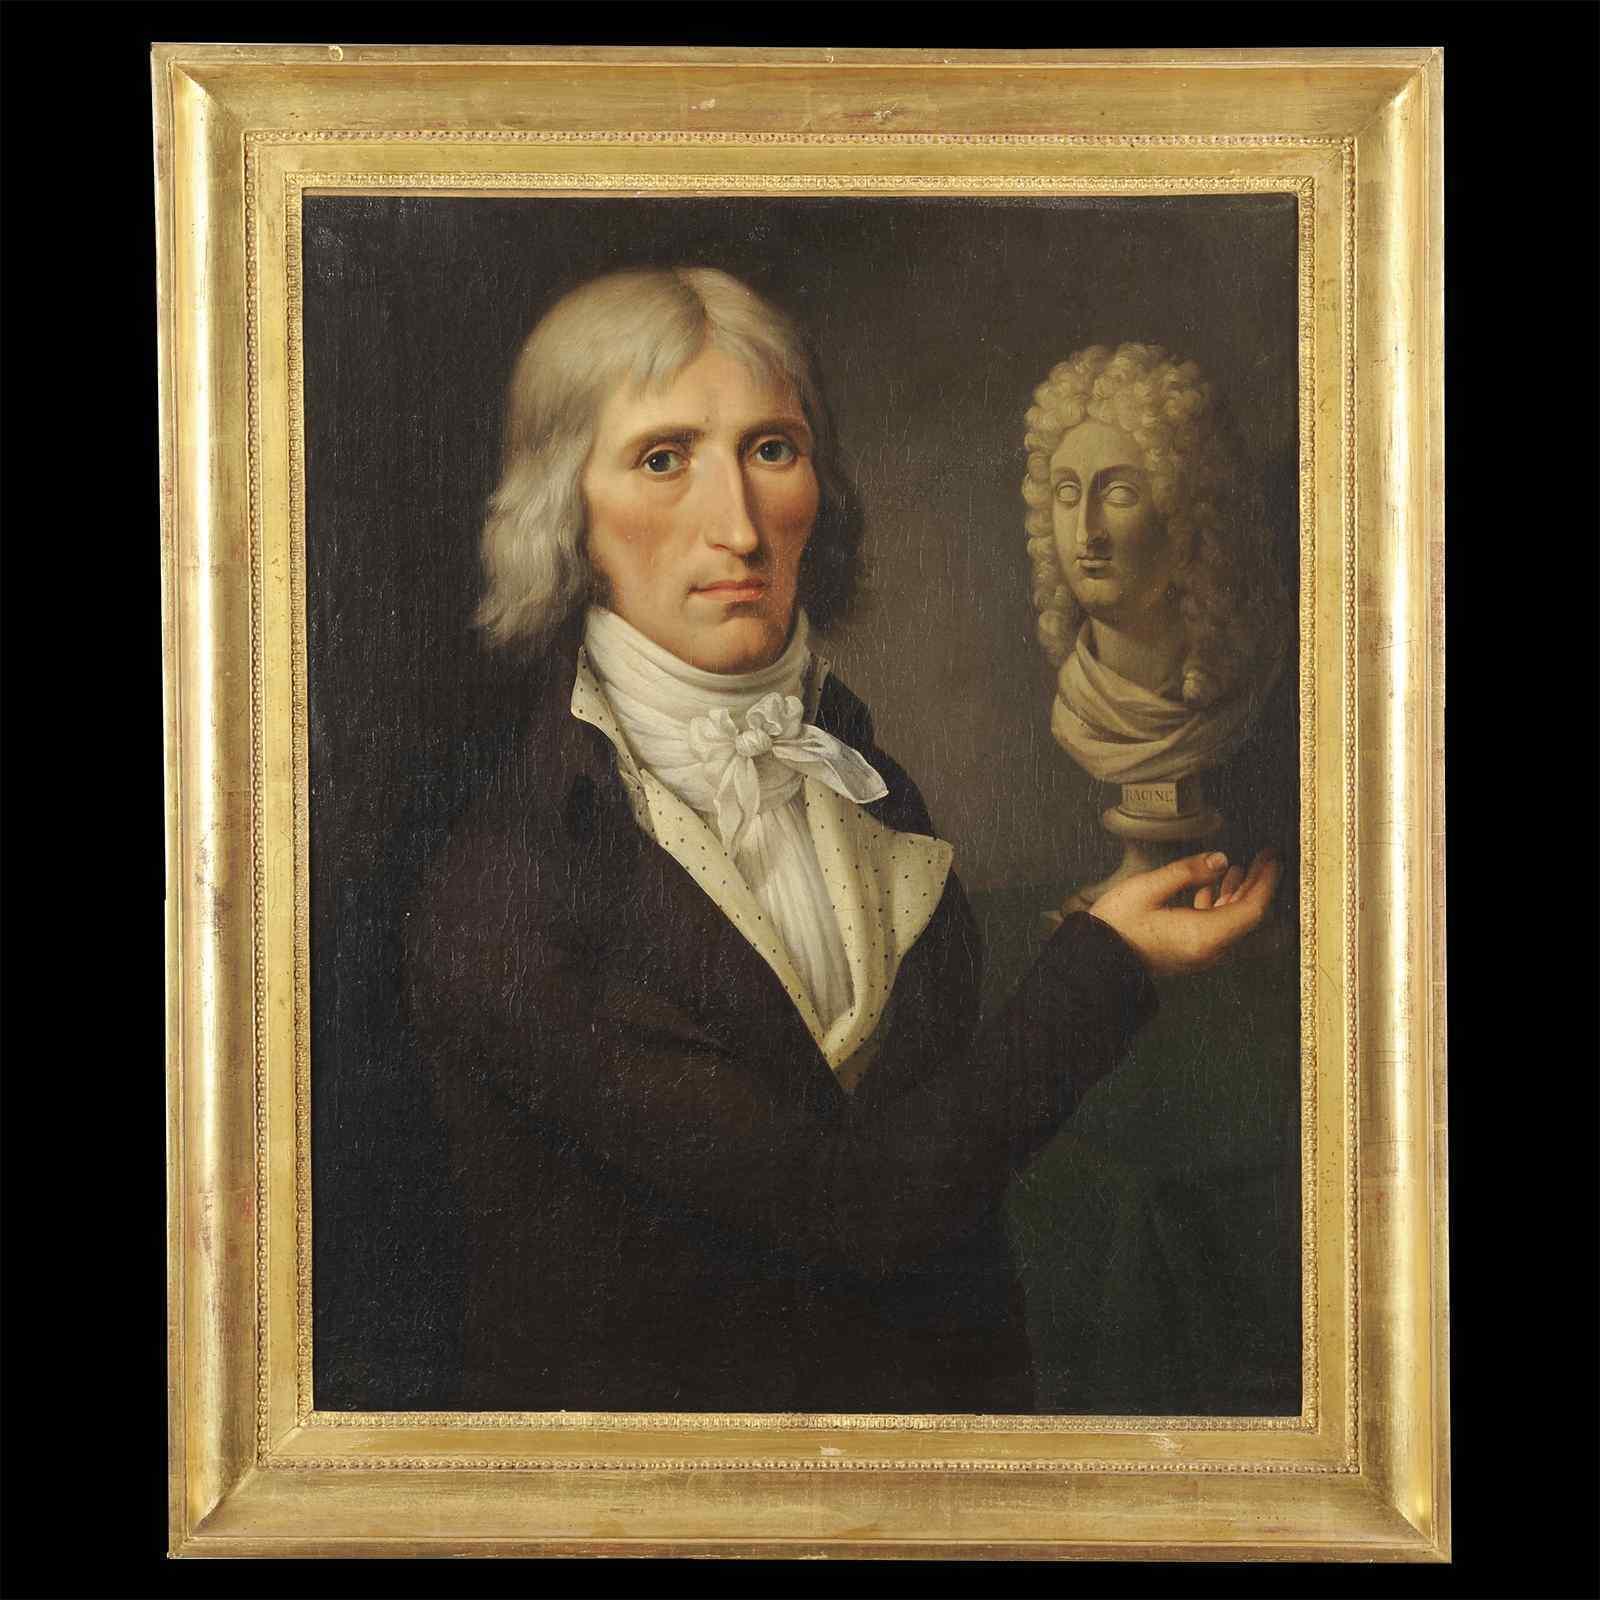 Portrait of Man with Racine bust - Around 1795 French school